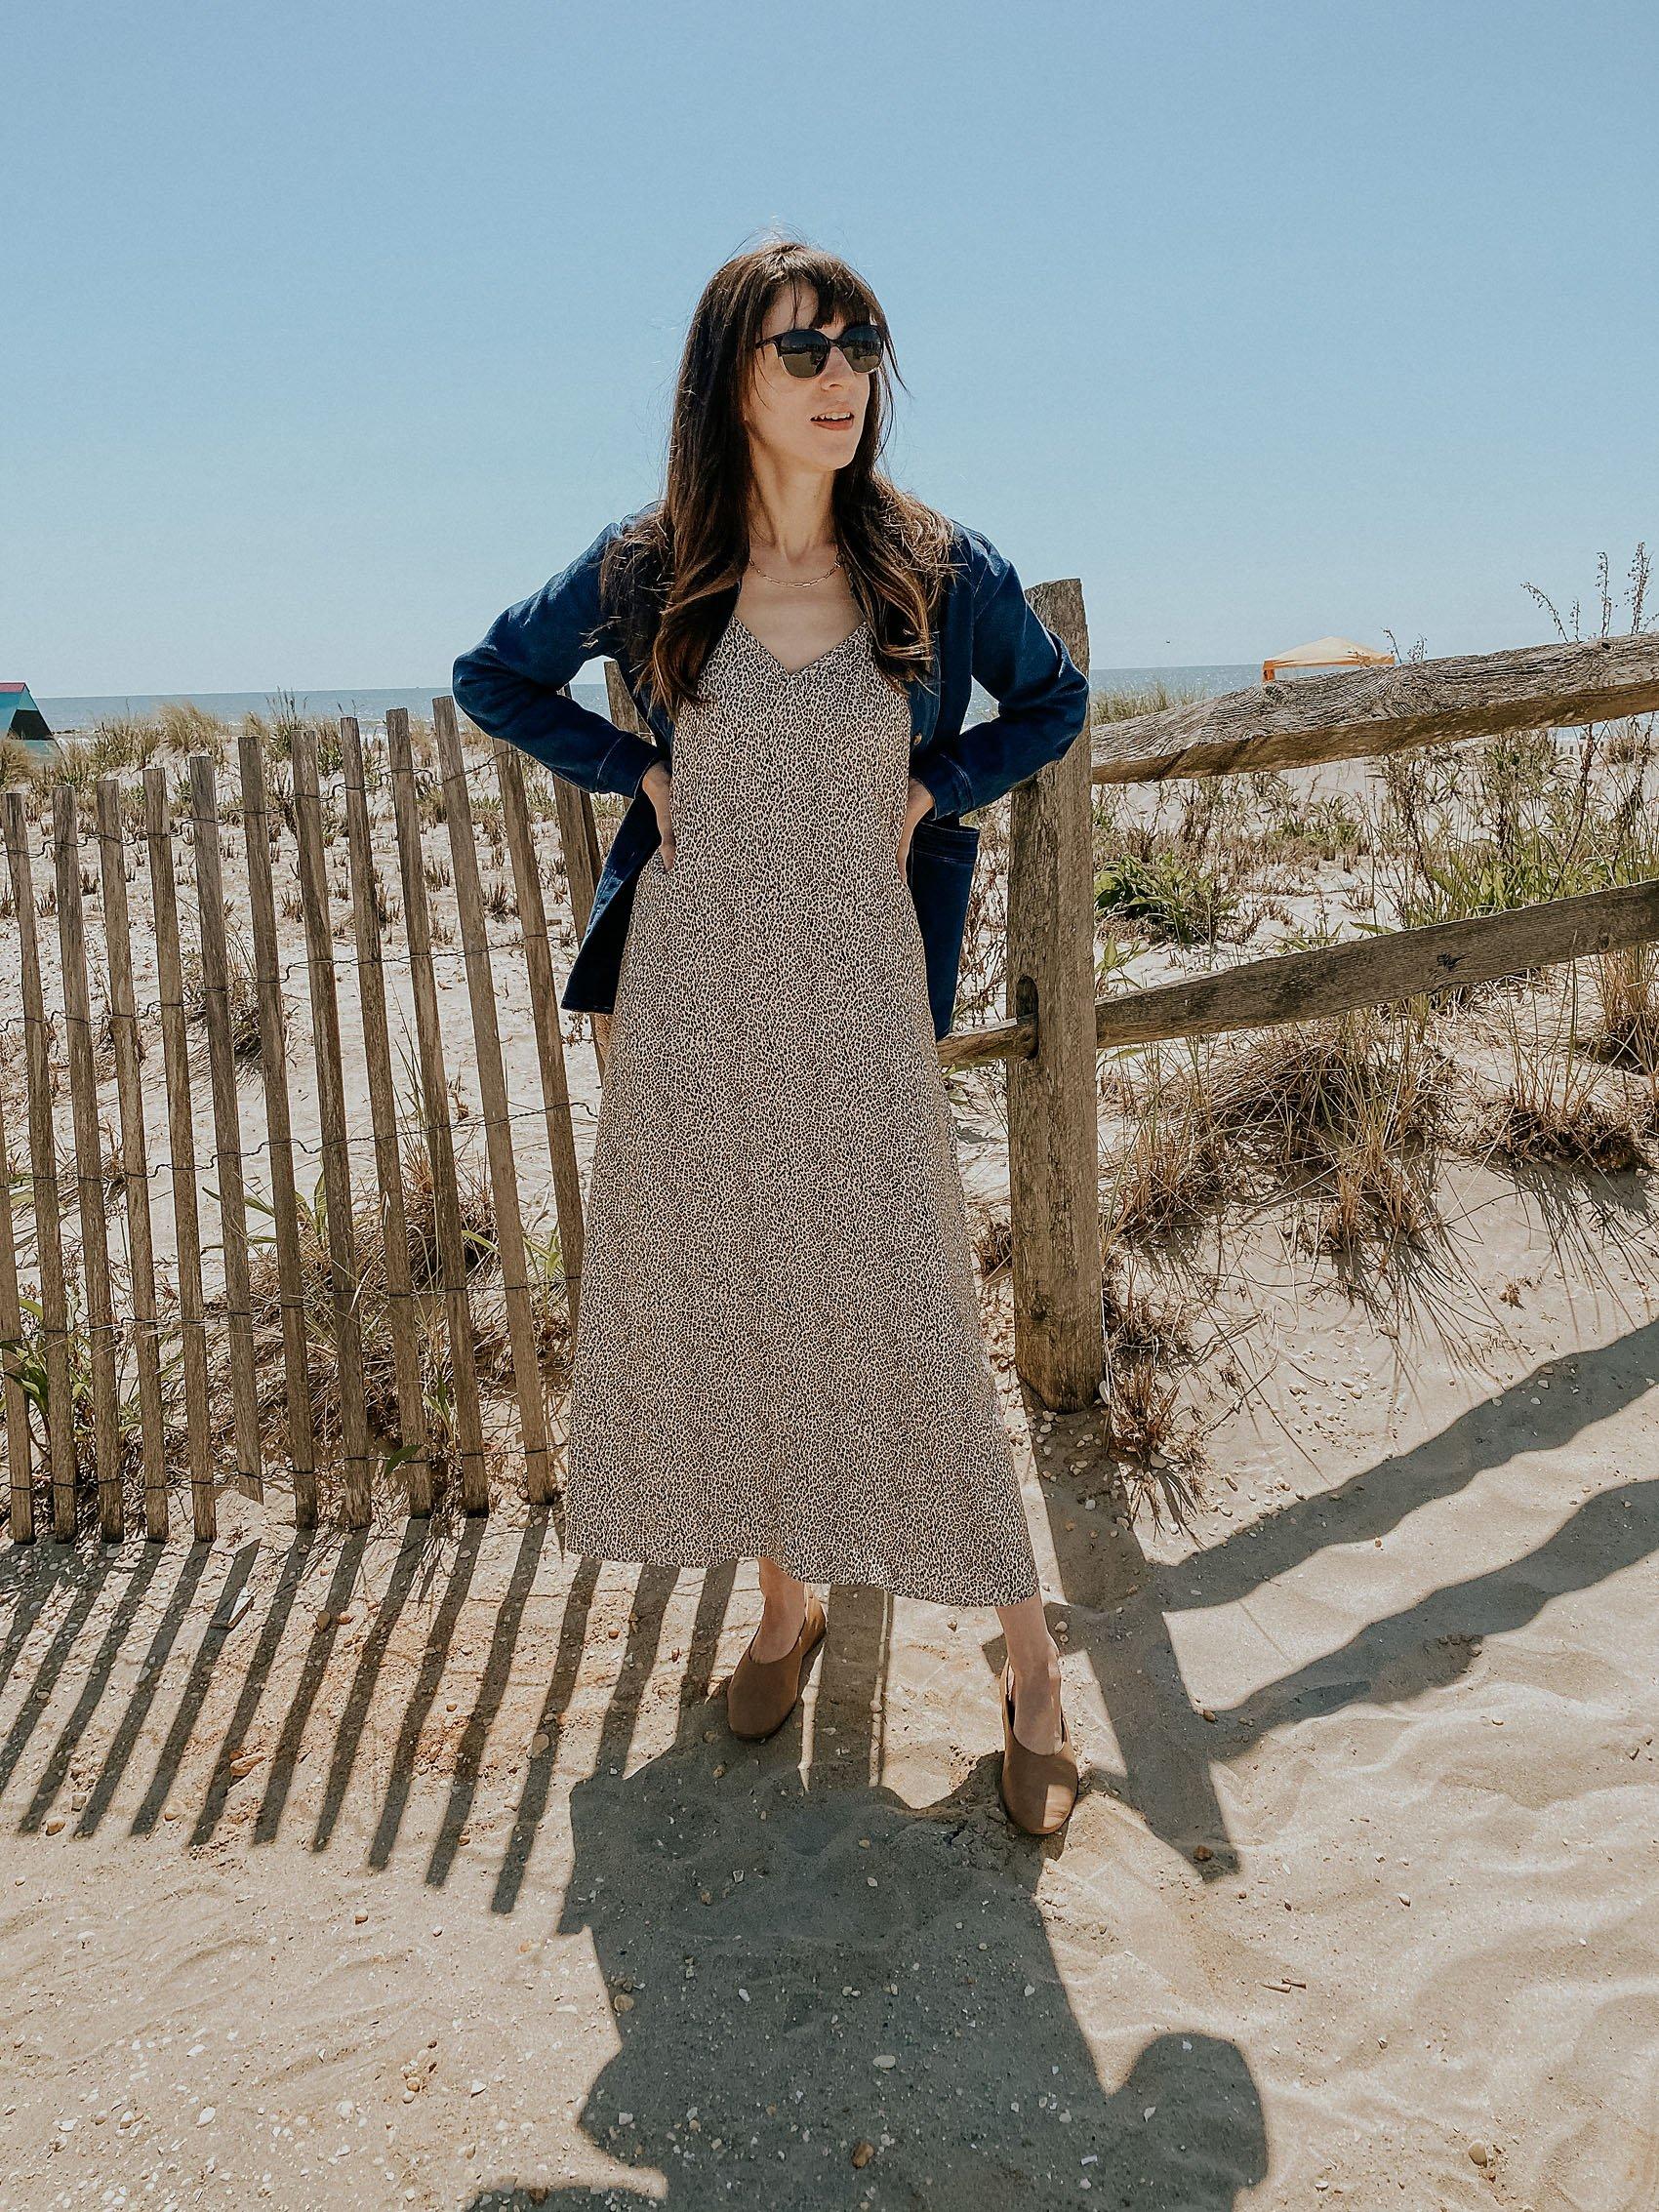 Jenni Kayne Leopard Slip dress on woman standing on the beach